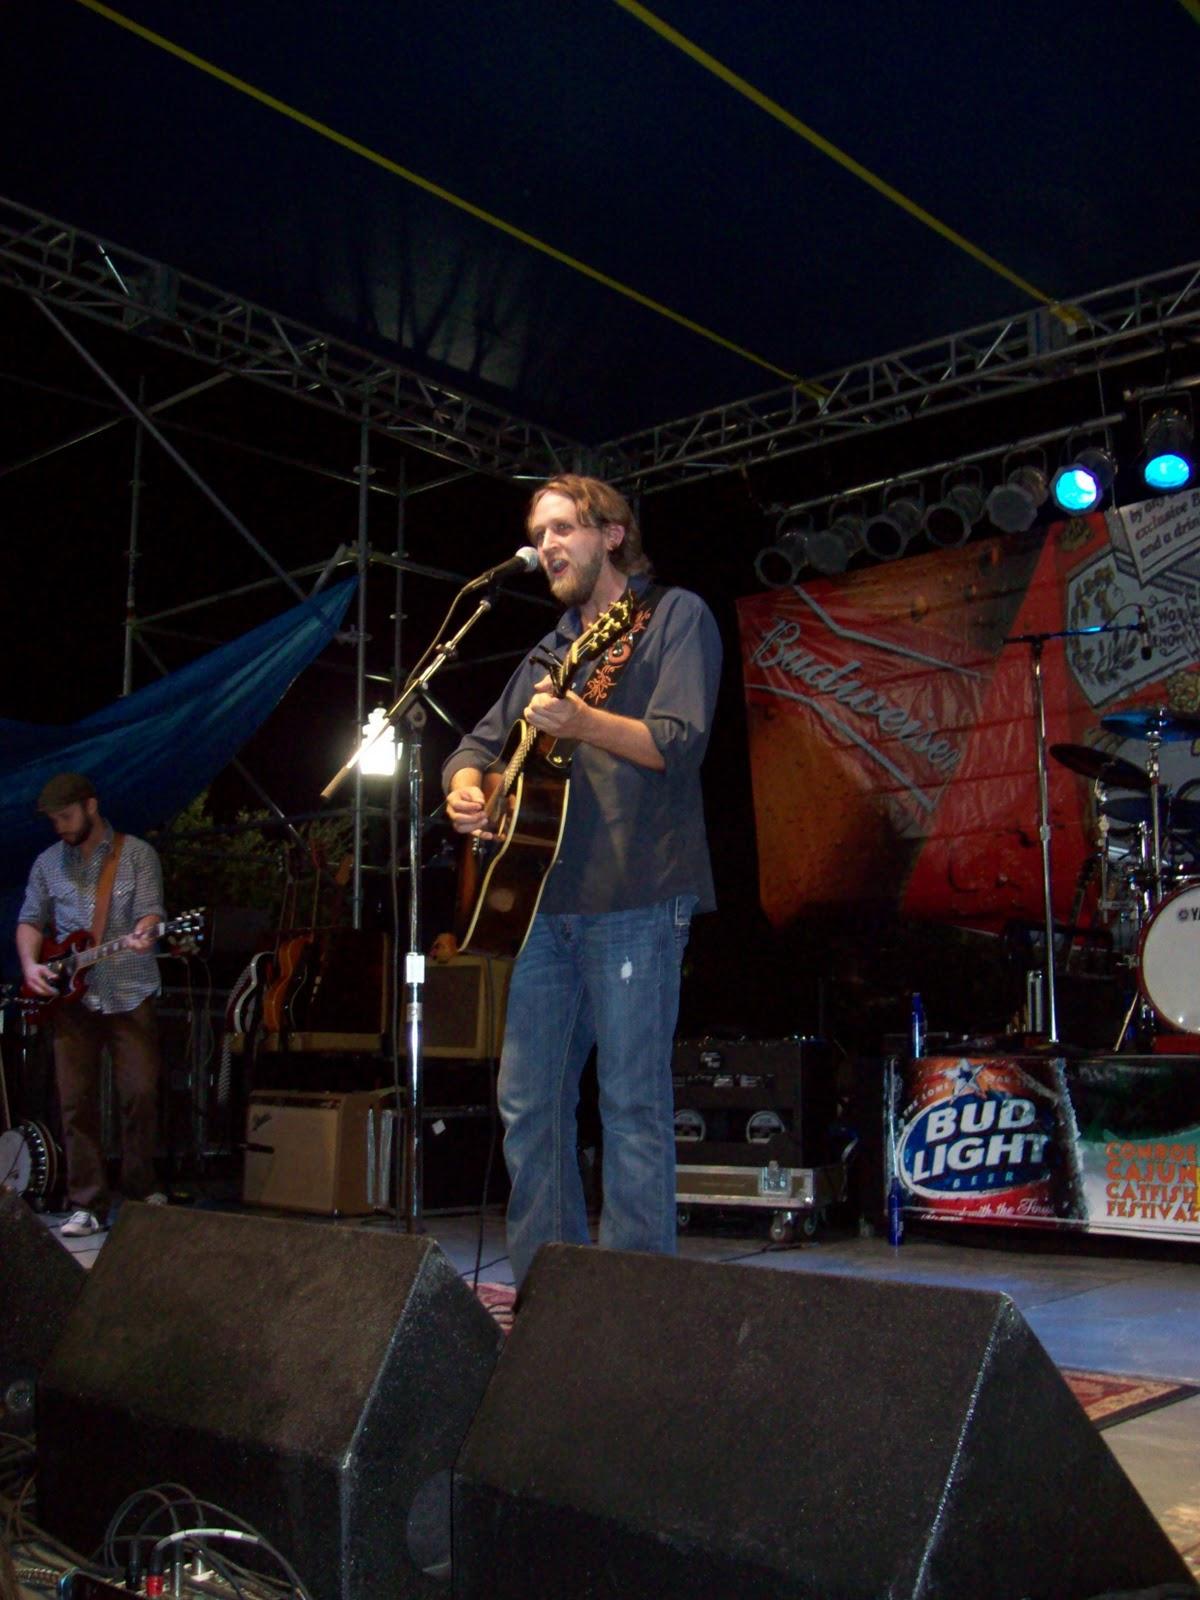 Conroe Cajun Catfish Festival - 101_0508.JPG